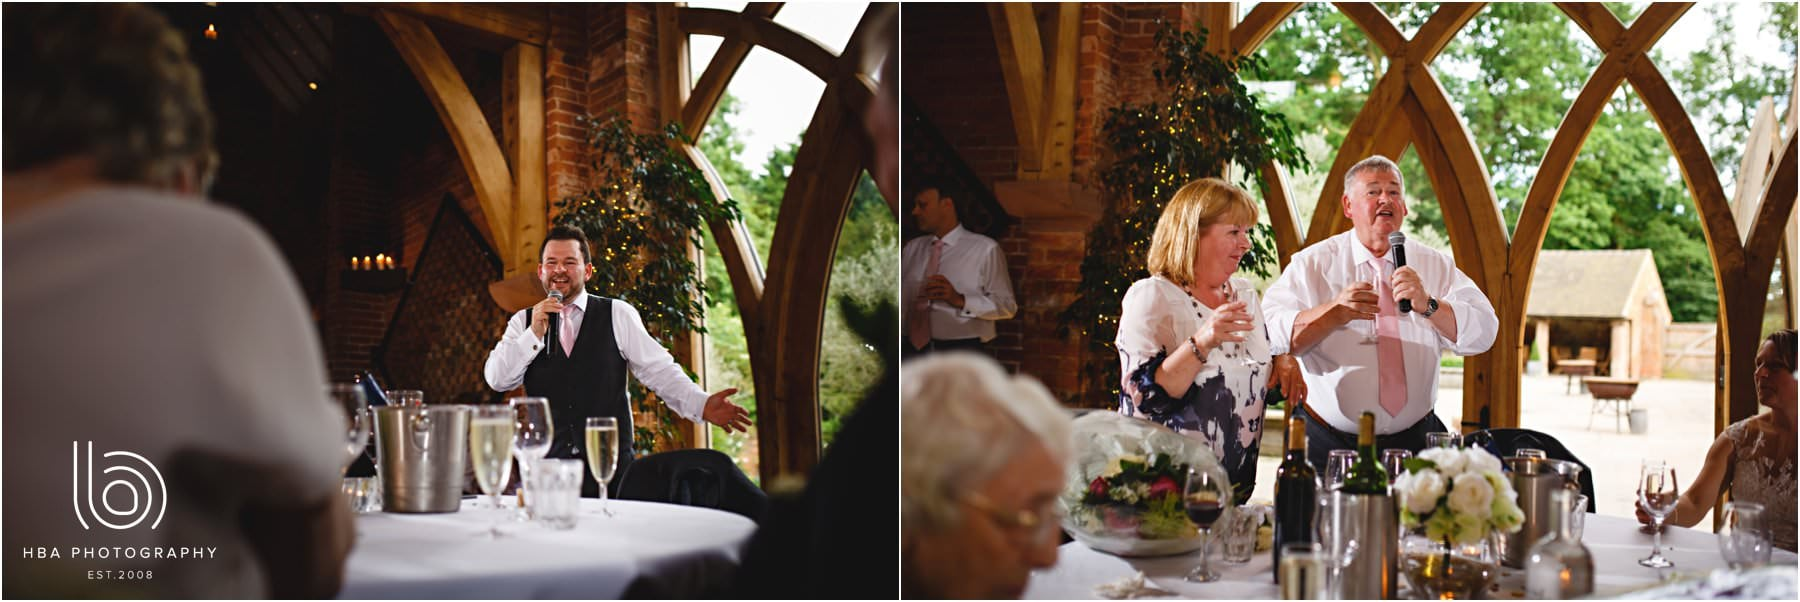 he wedding speeches